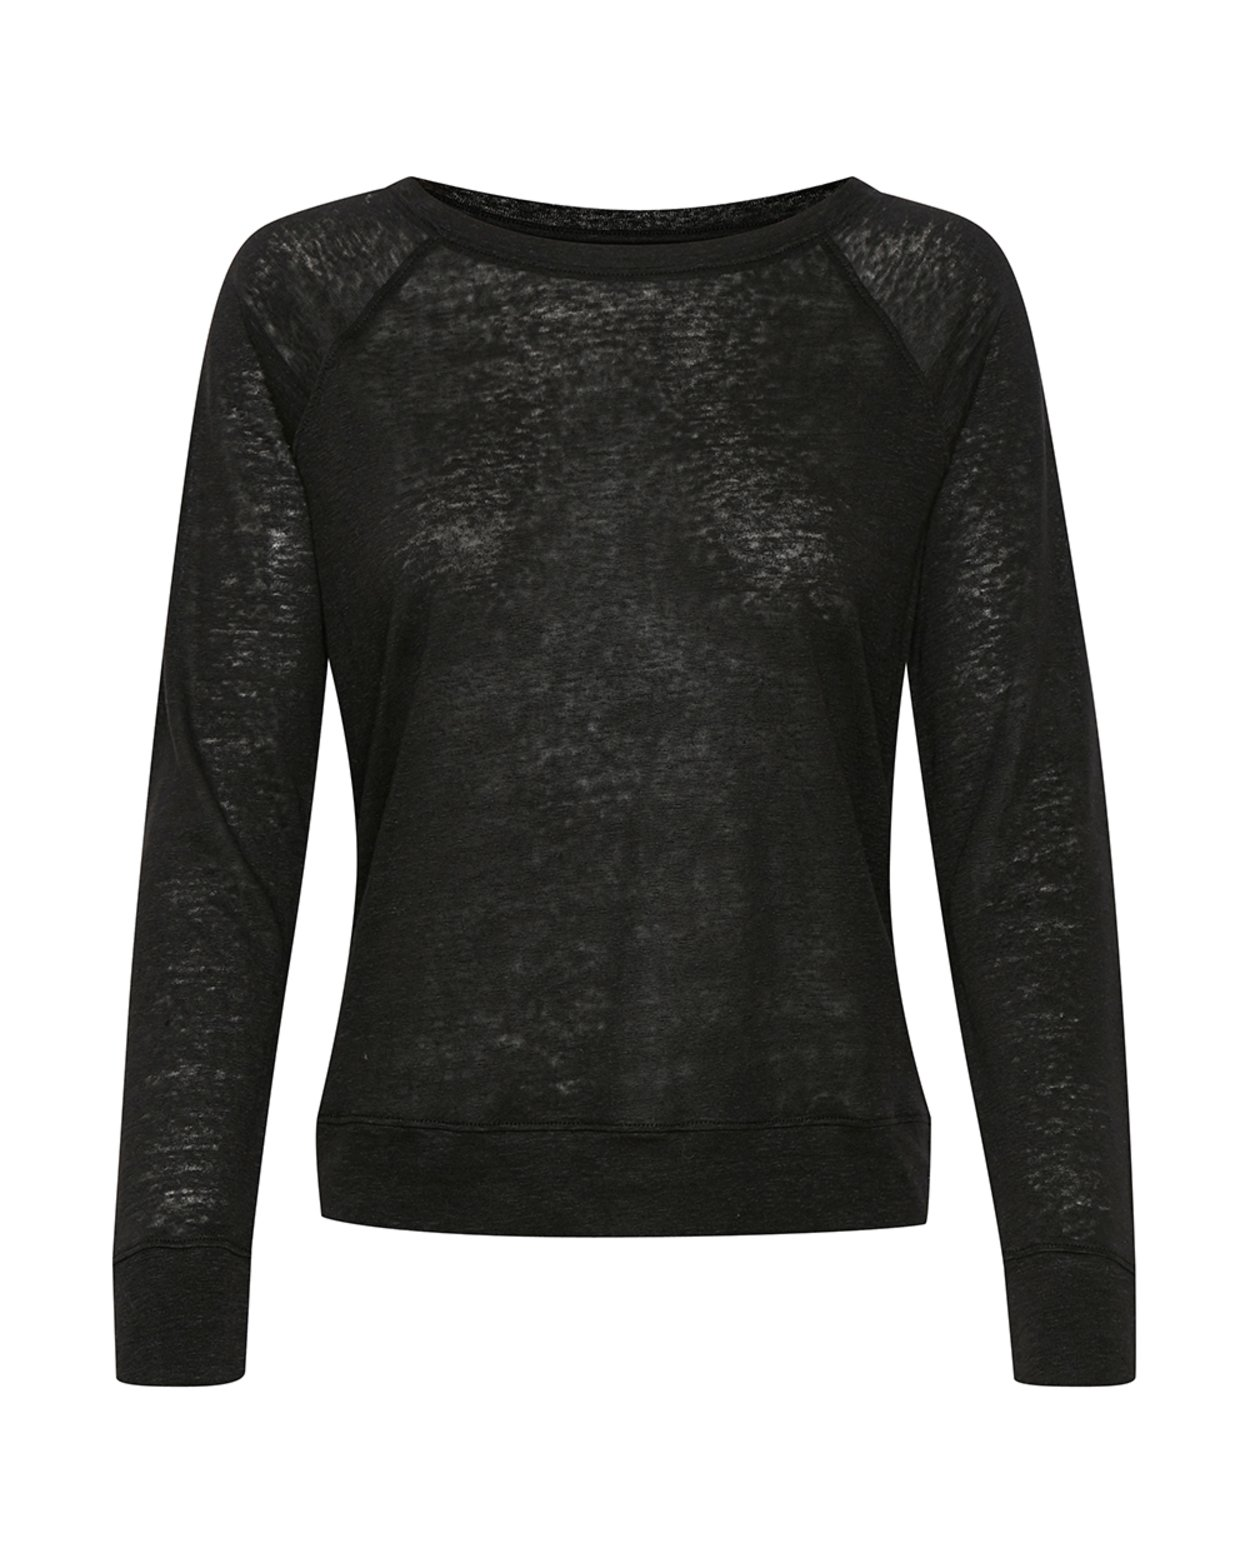 Huma Long Sleeve T-Shirt